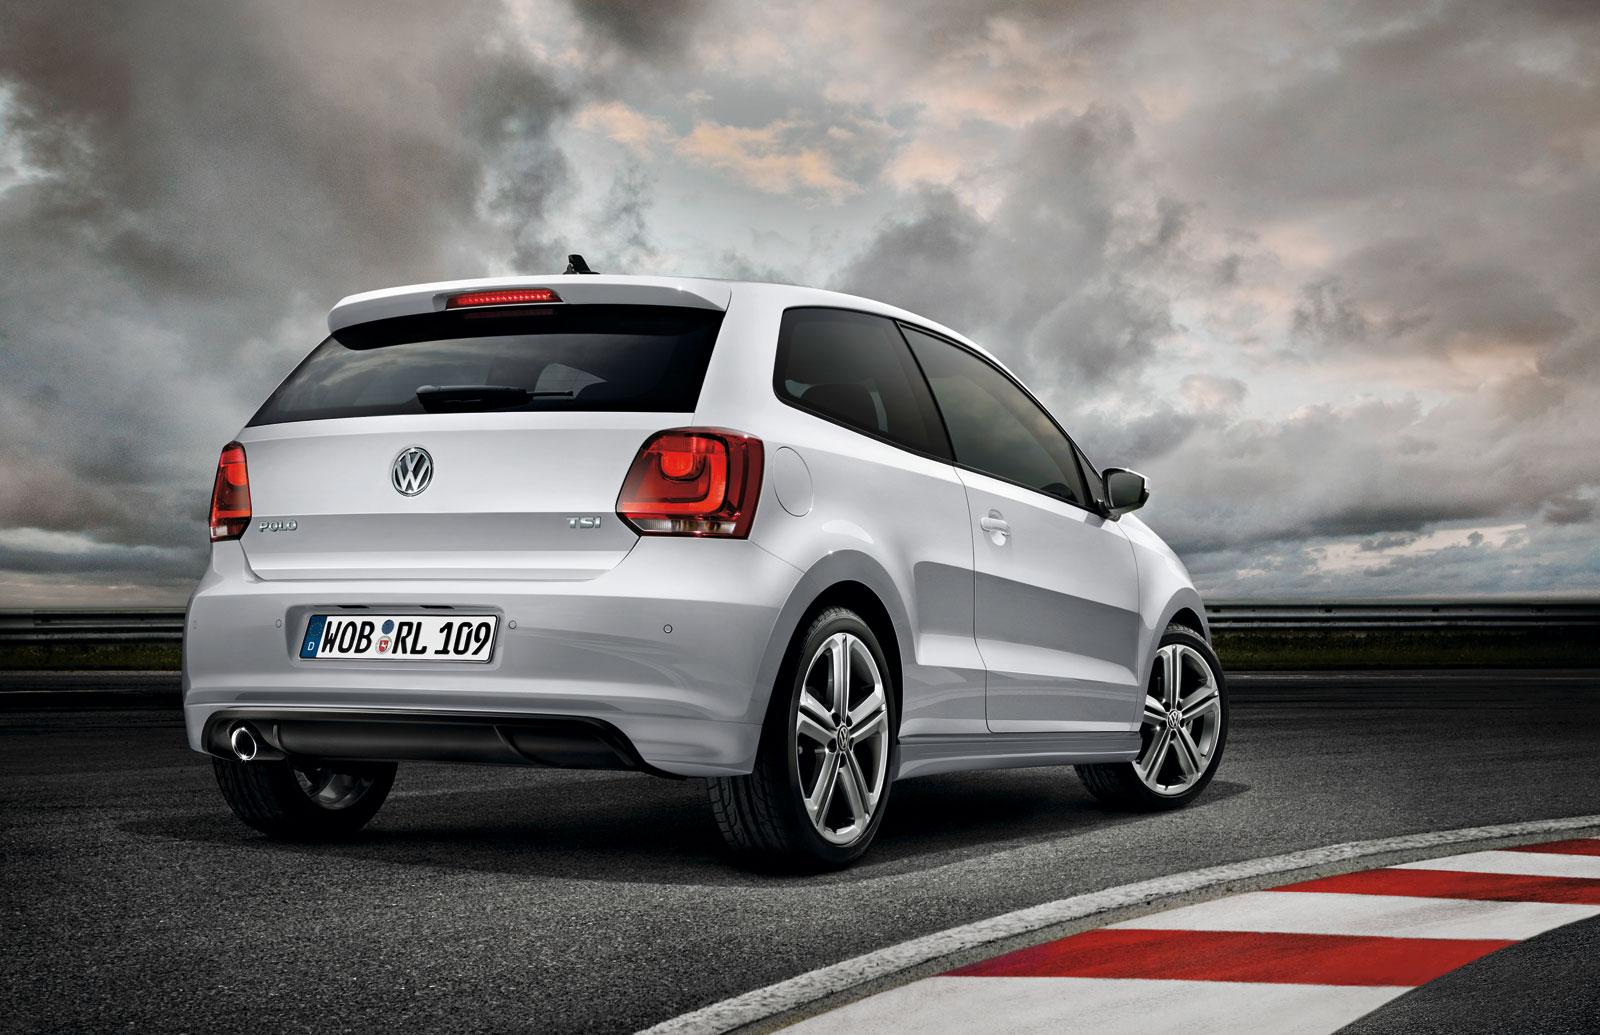 Sport Cars Volkswagen Polo TSI R Line hd Wallpapers 2012 1600x1035